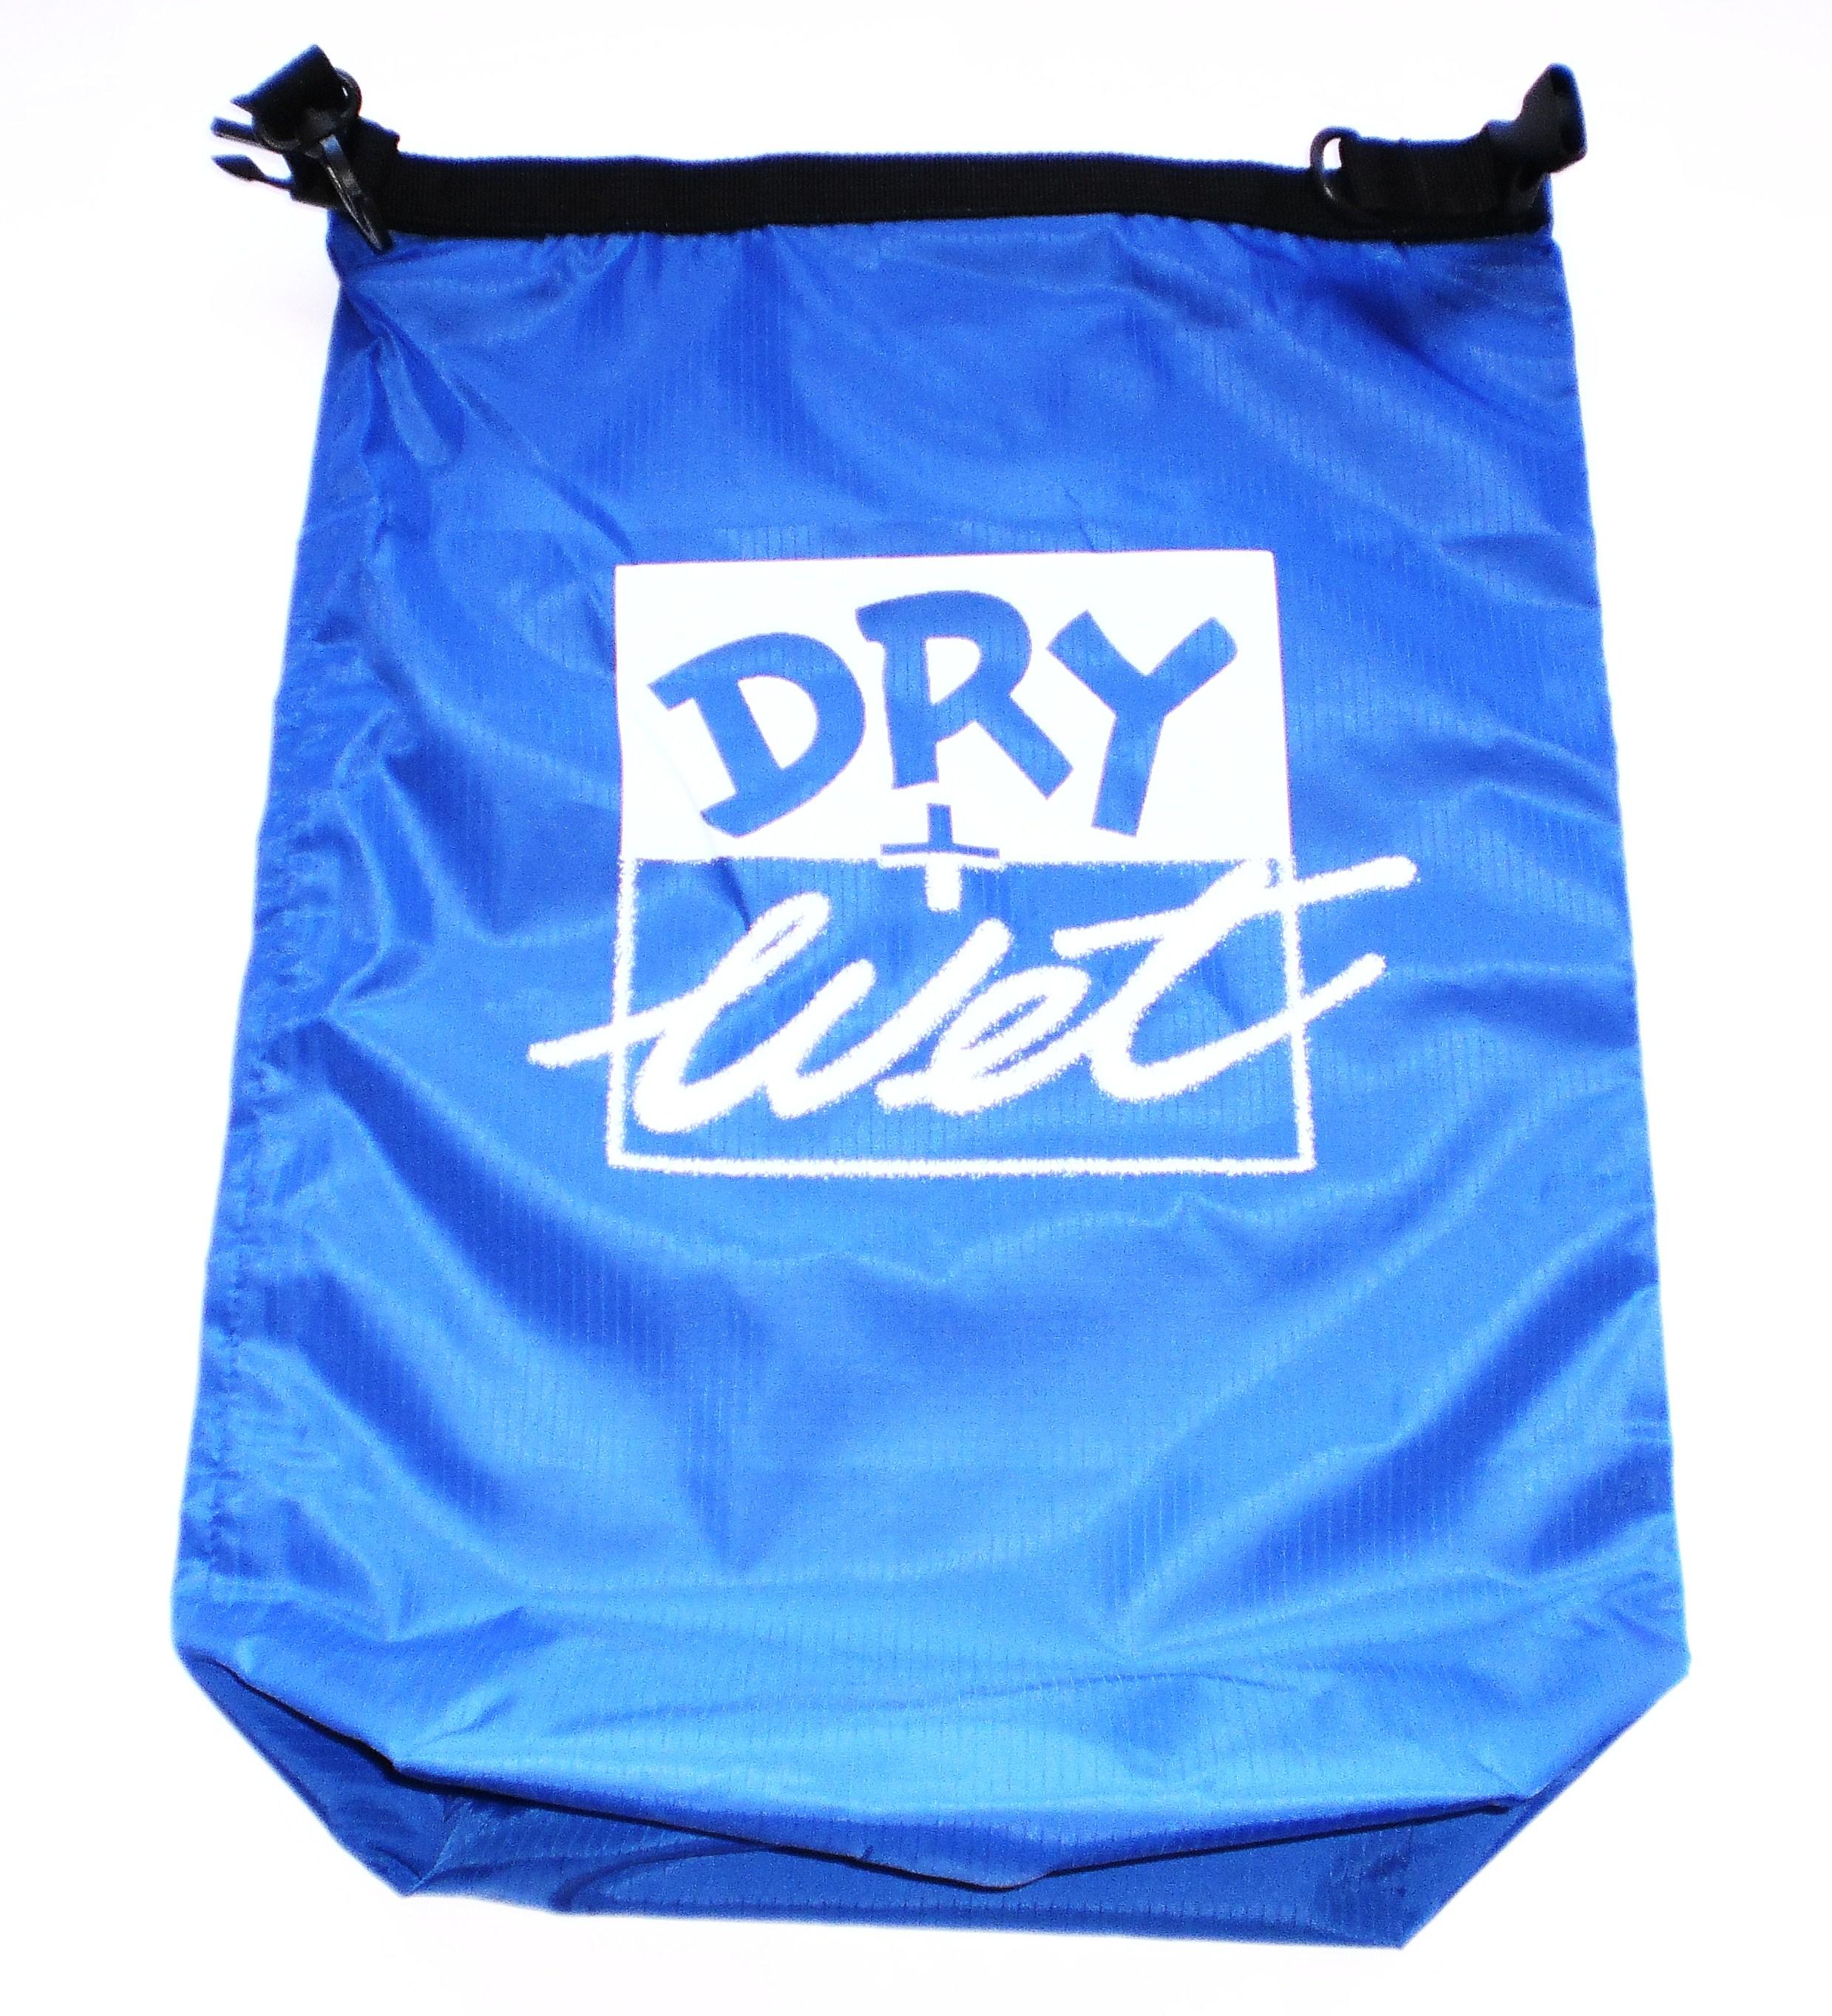 Riff Wet Bag in verschiedenen Farben